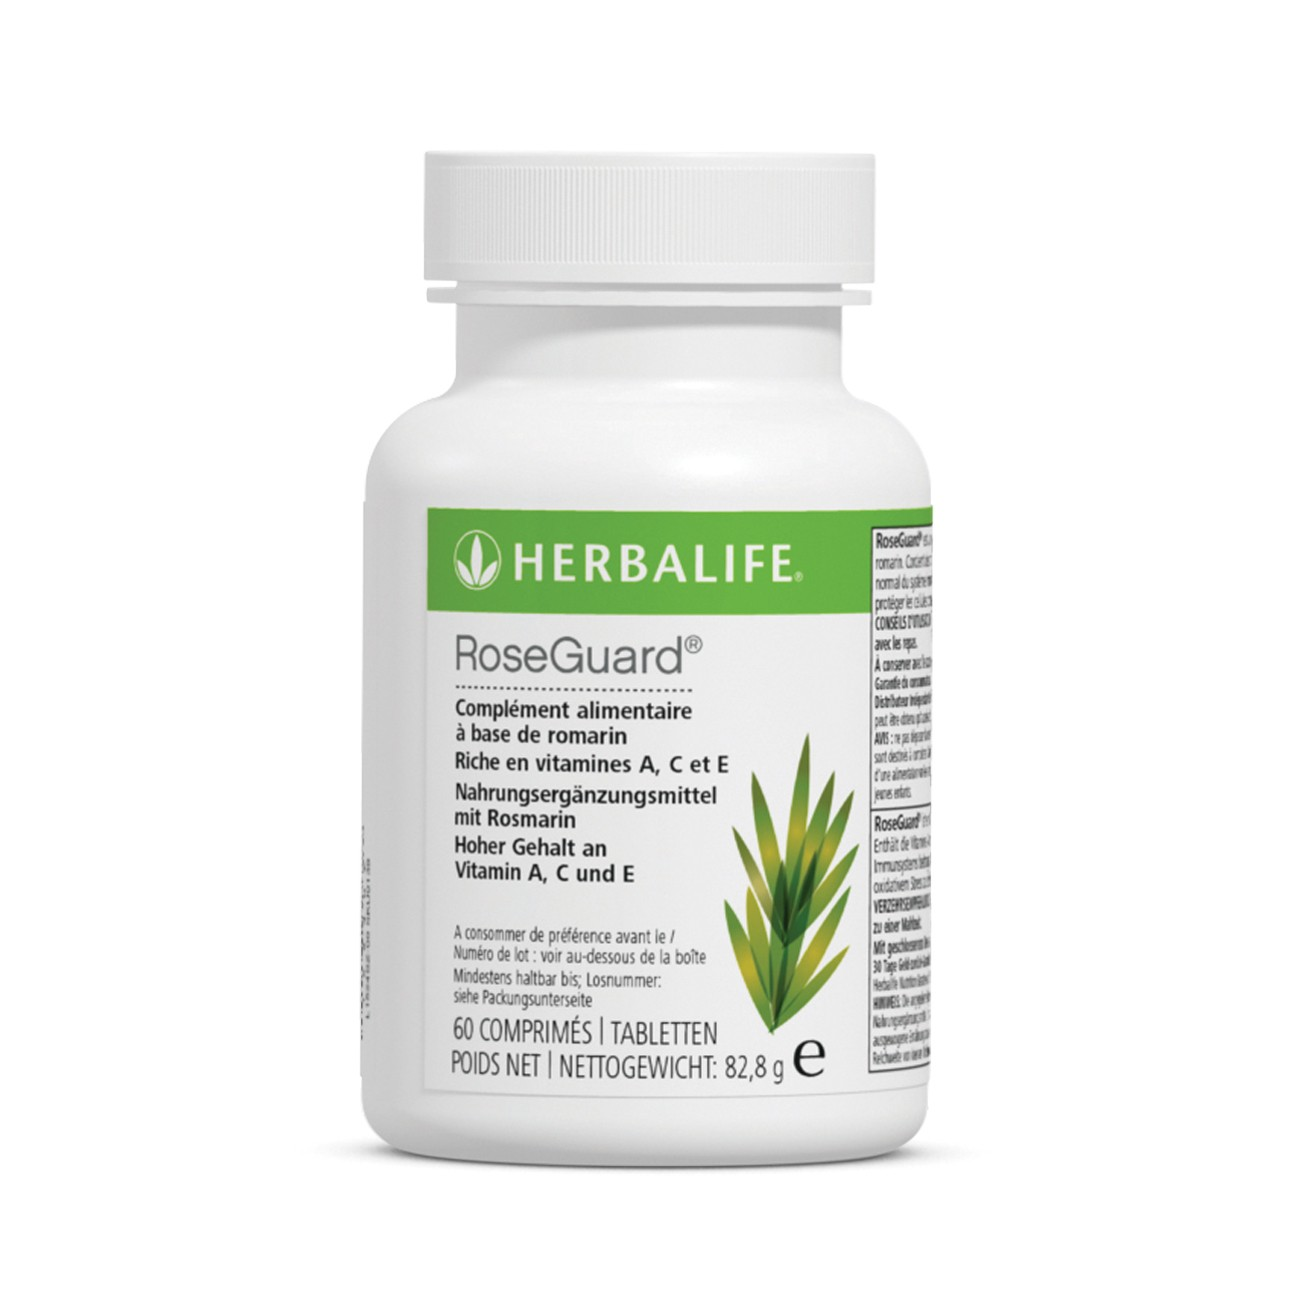 Herbalife RoseGuard 60 Tabletten